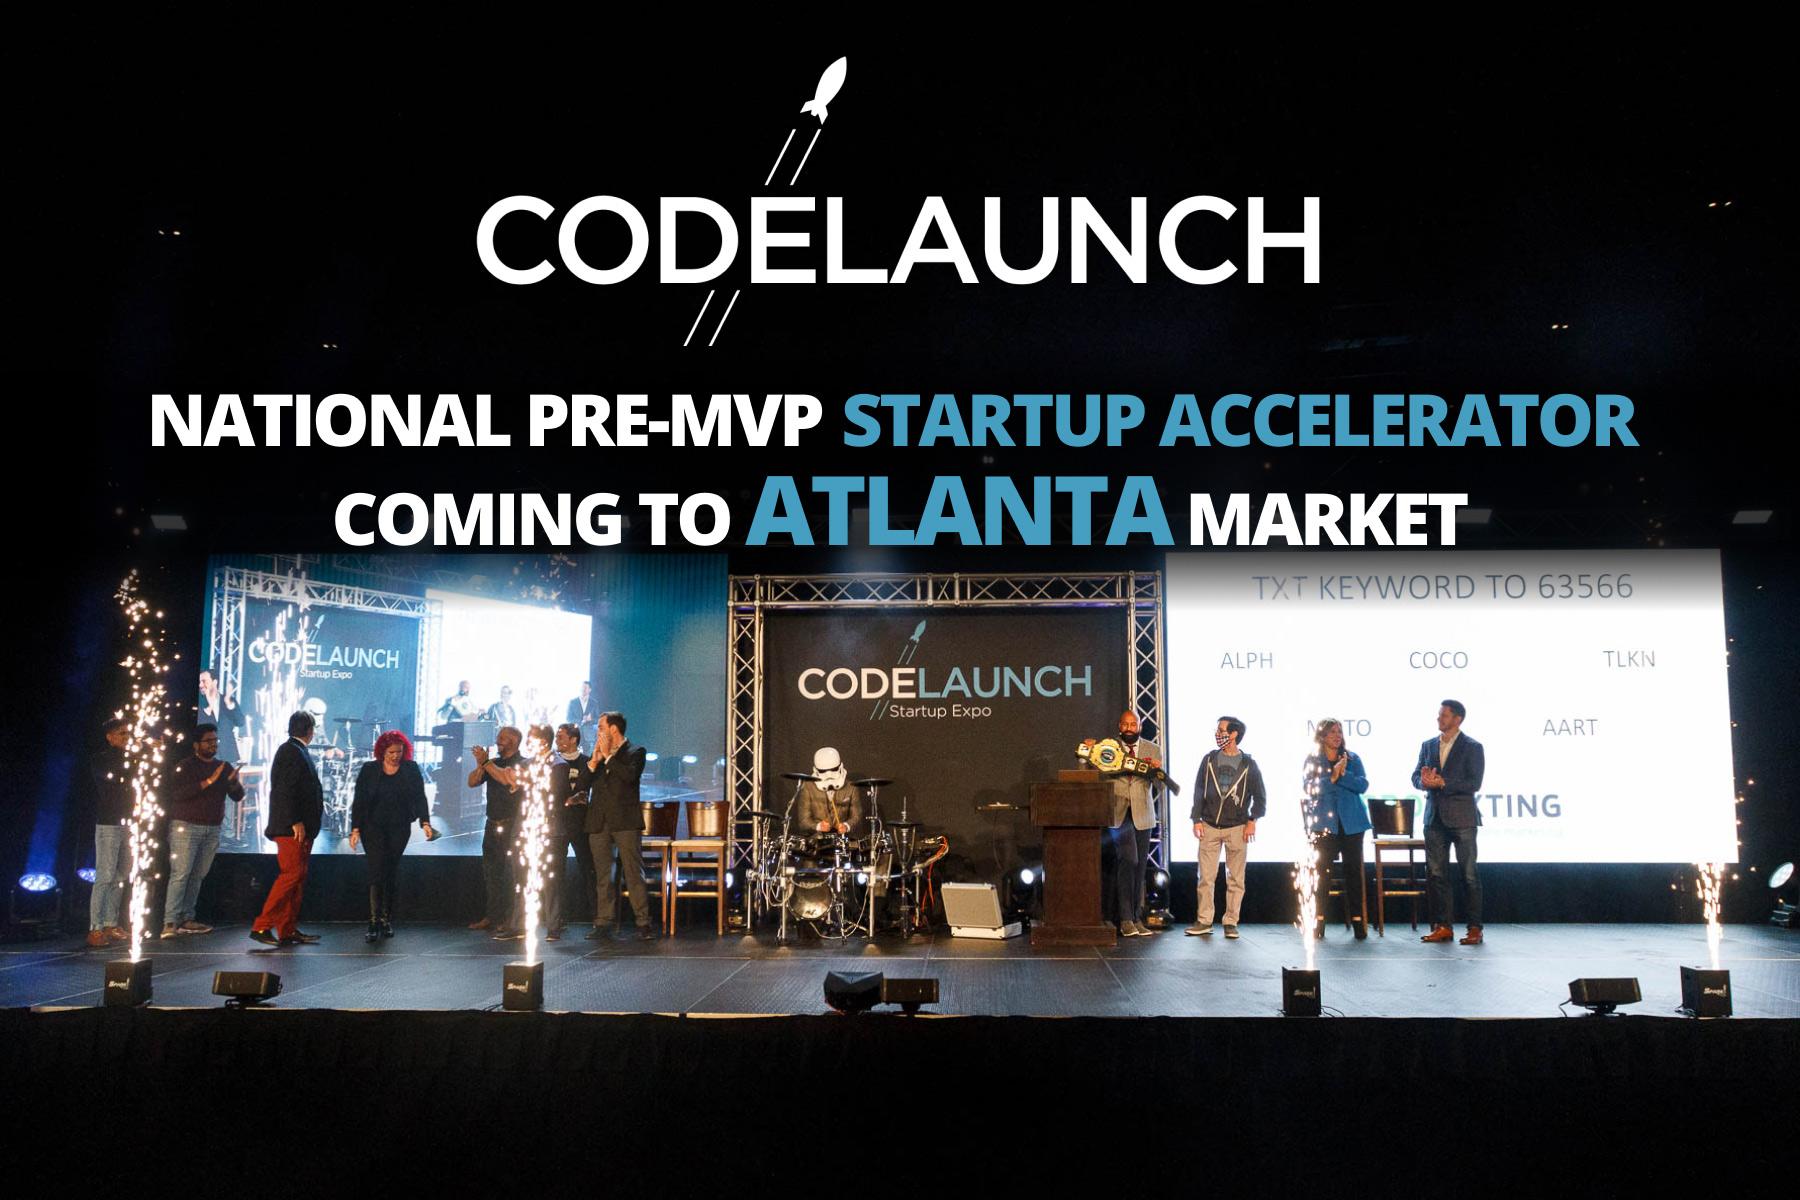 National Pre-MVP Startup Accelerator Coming to Atlanta Market